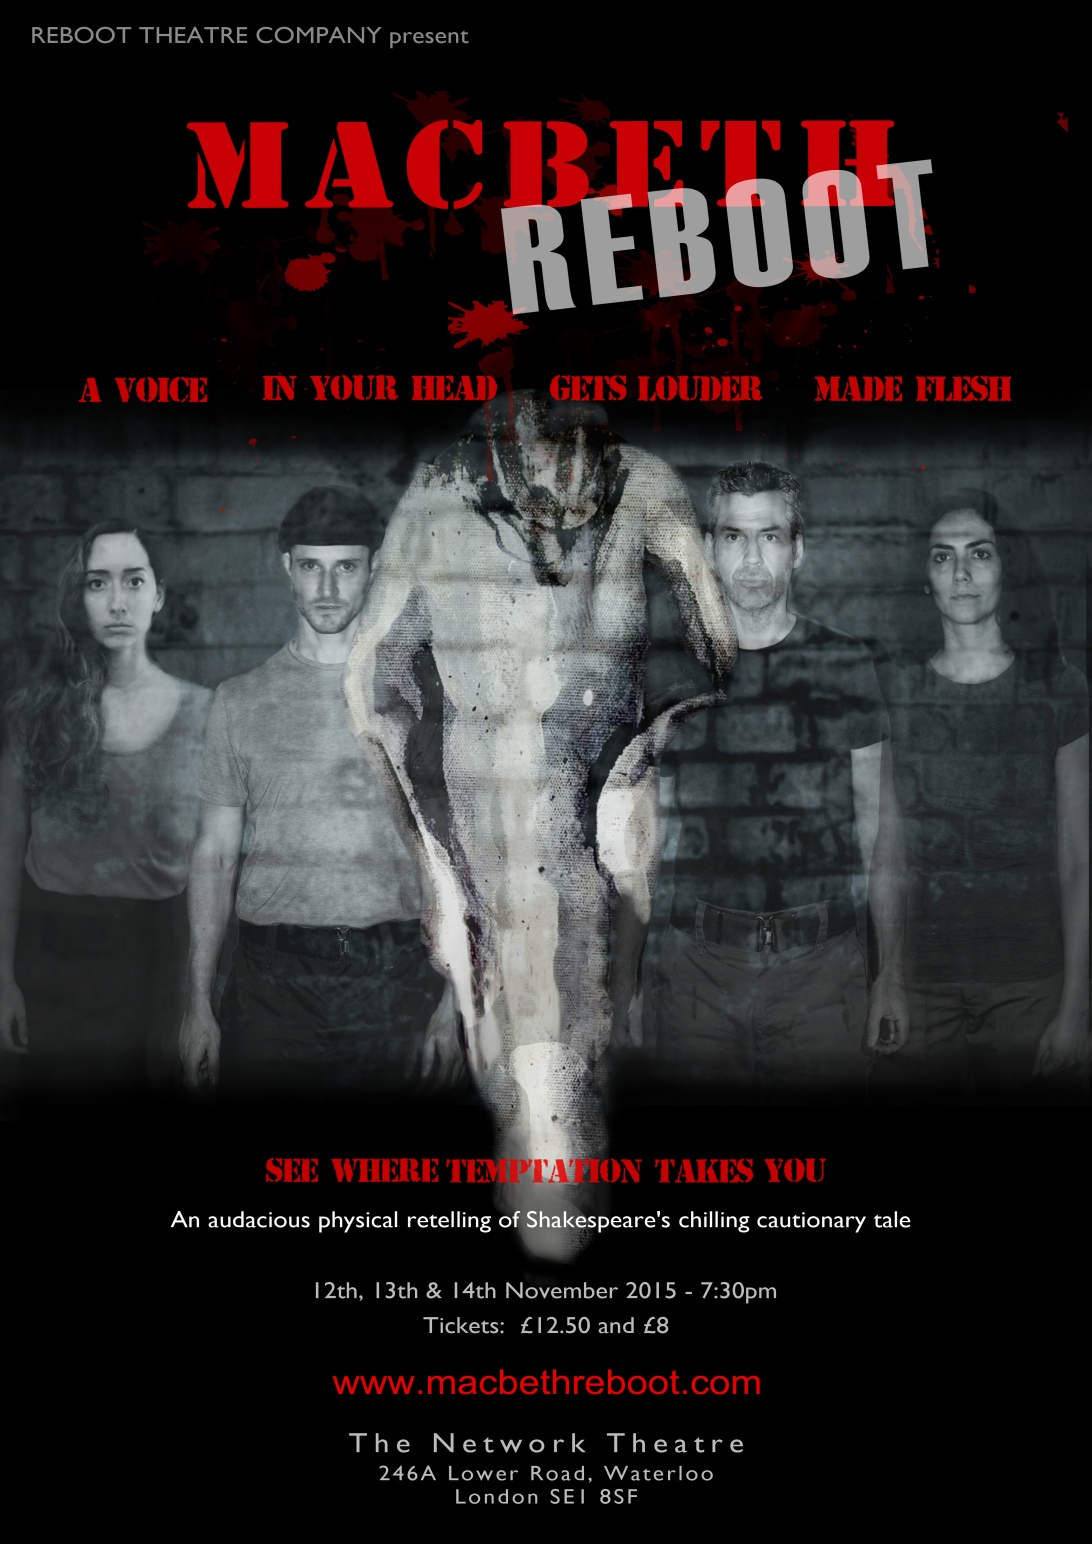 MacbethReboot_Poster